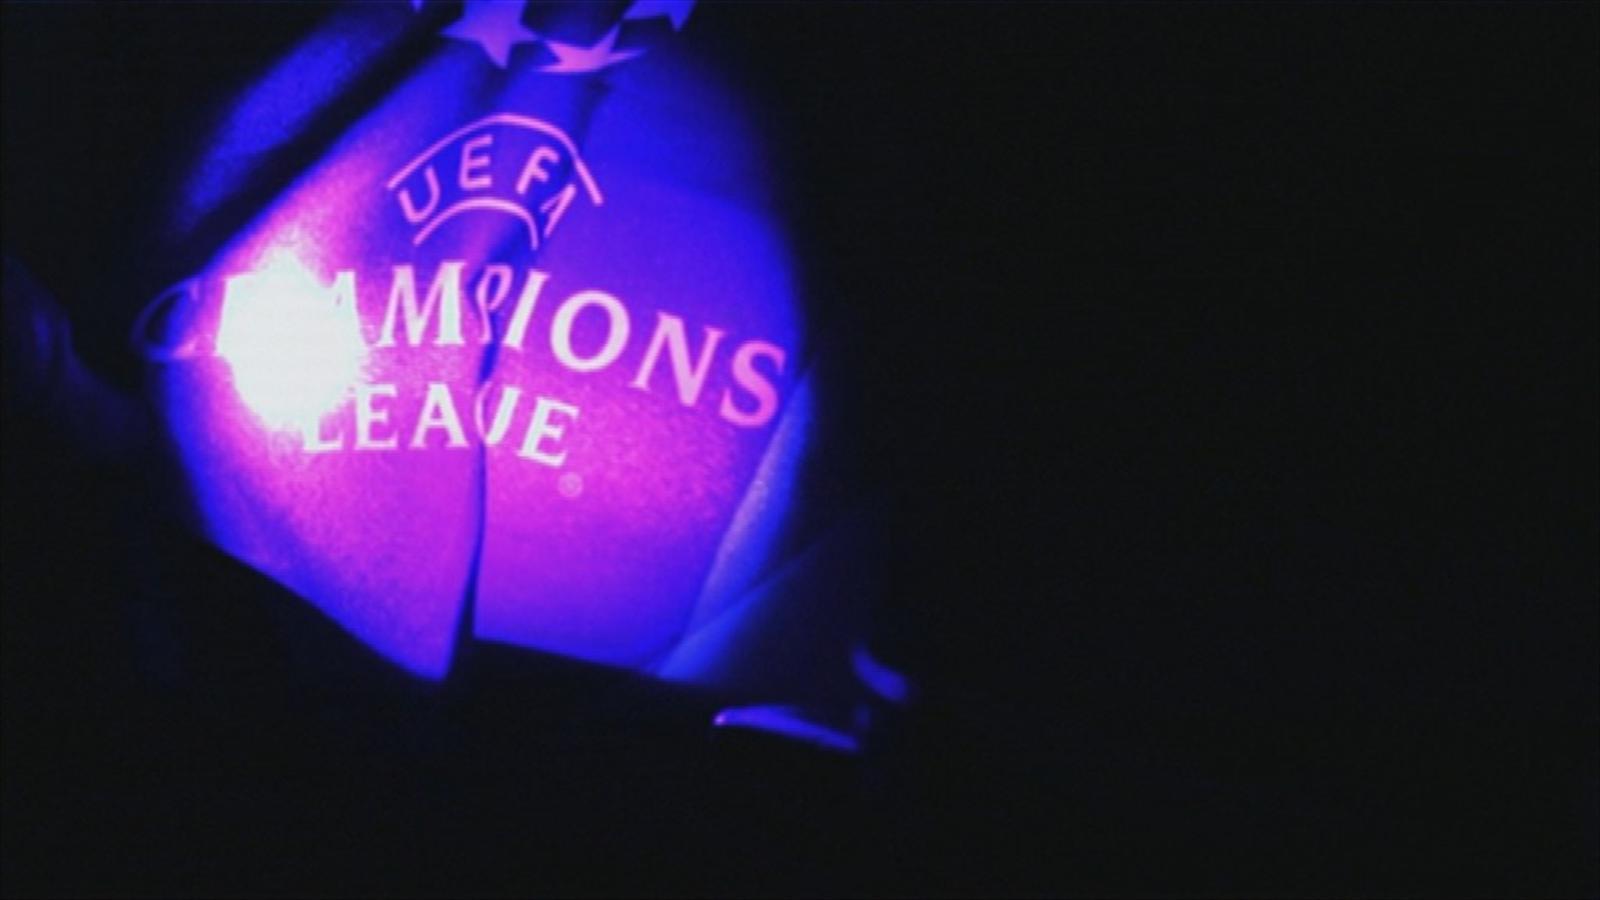 1217 chions league last 16 draw eurosport